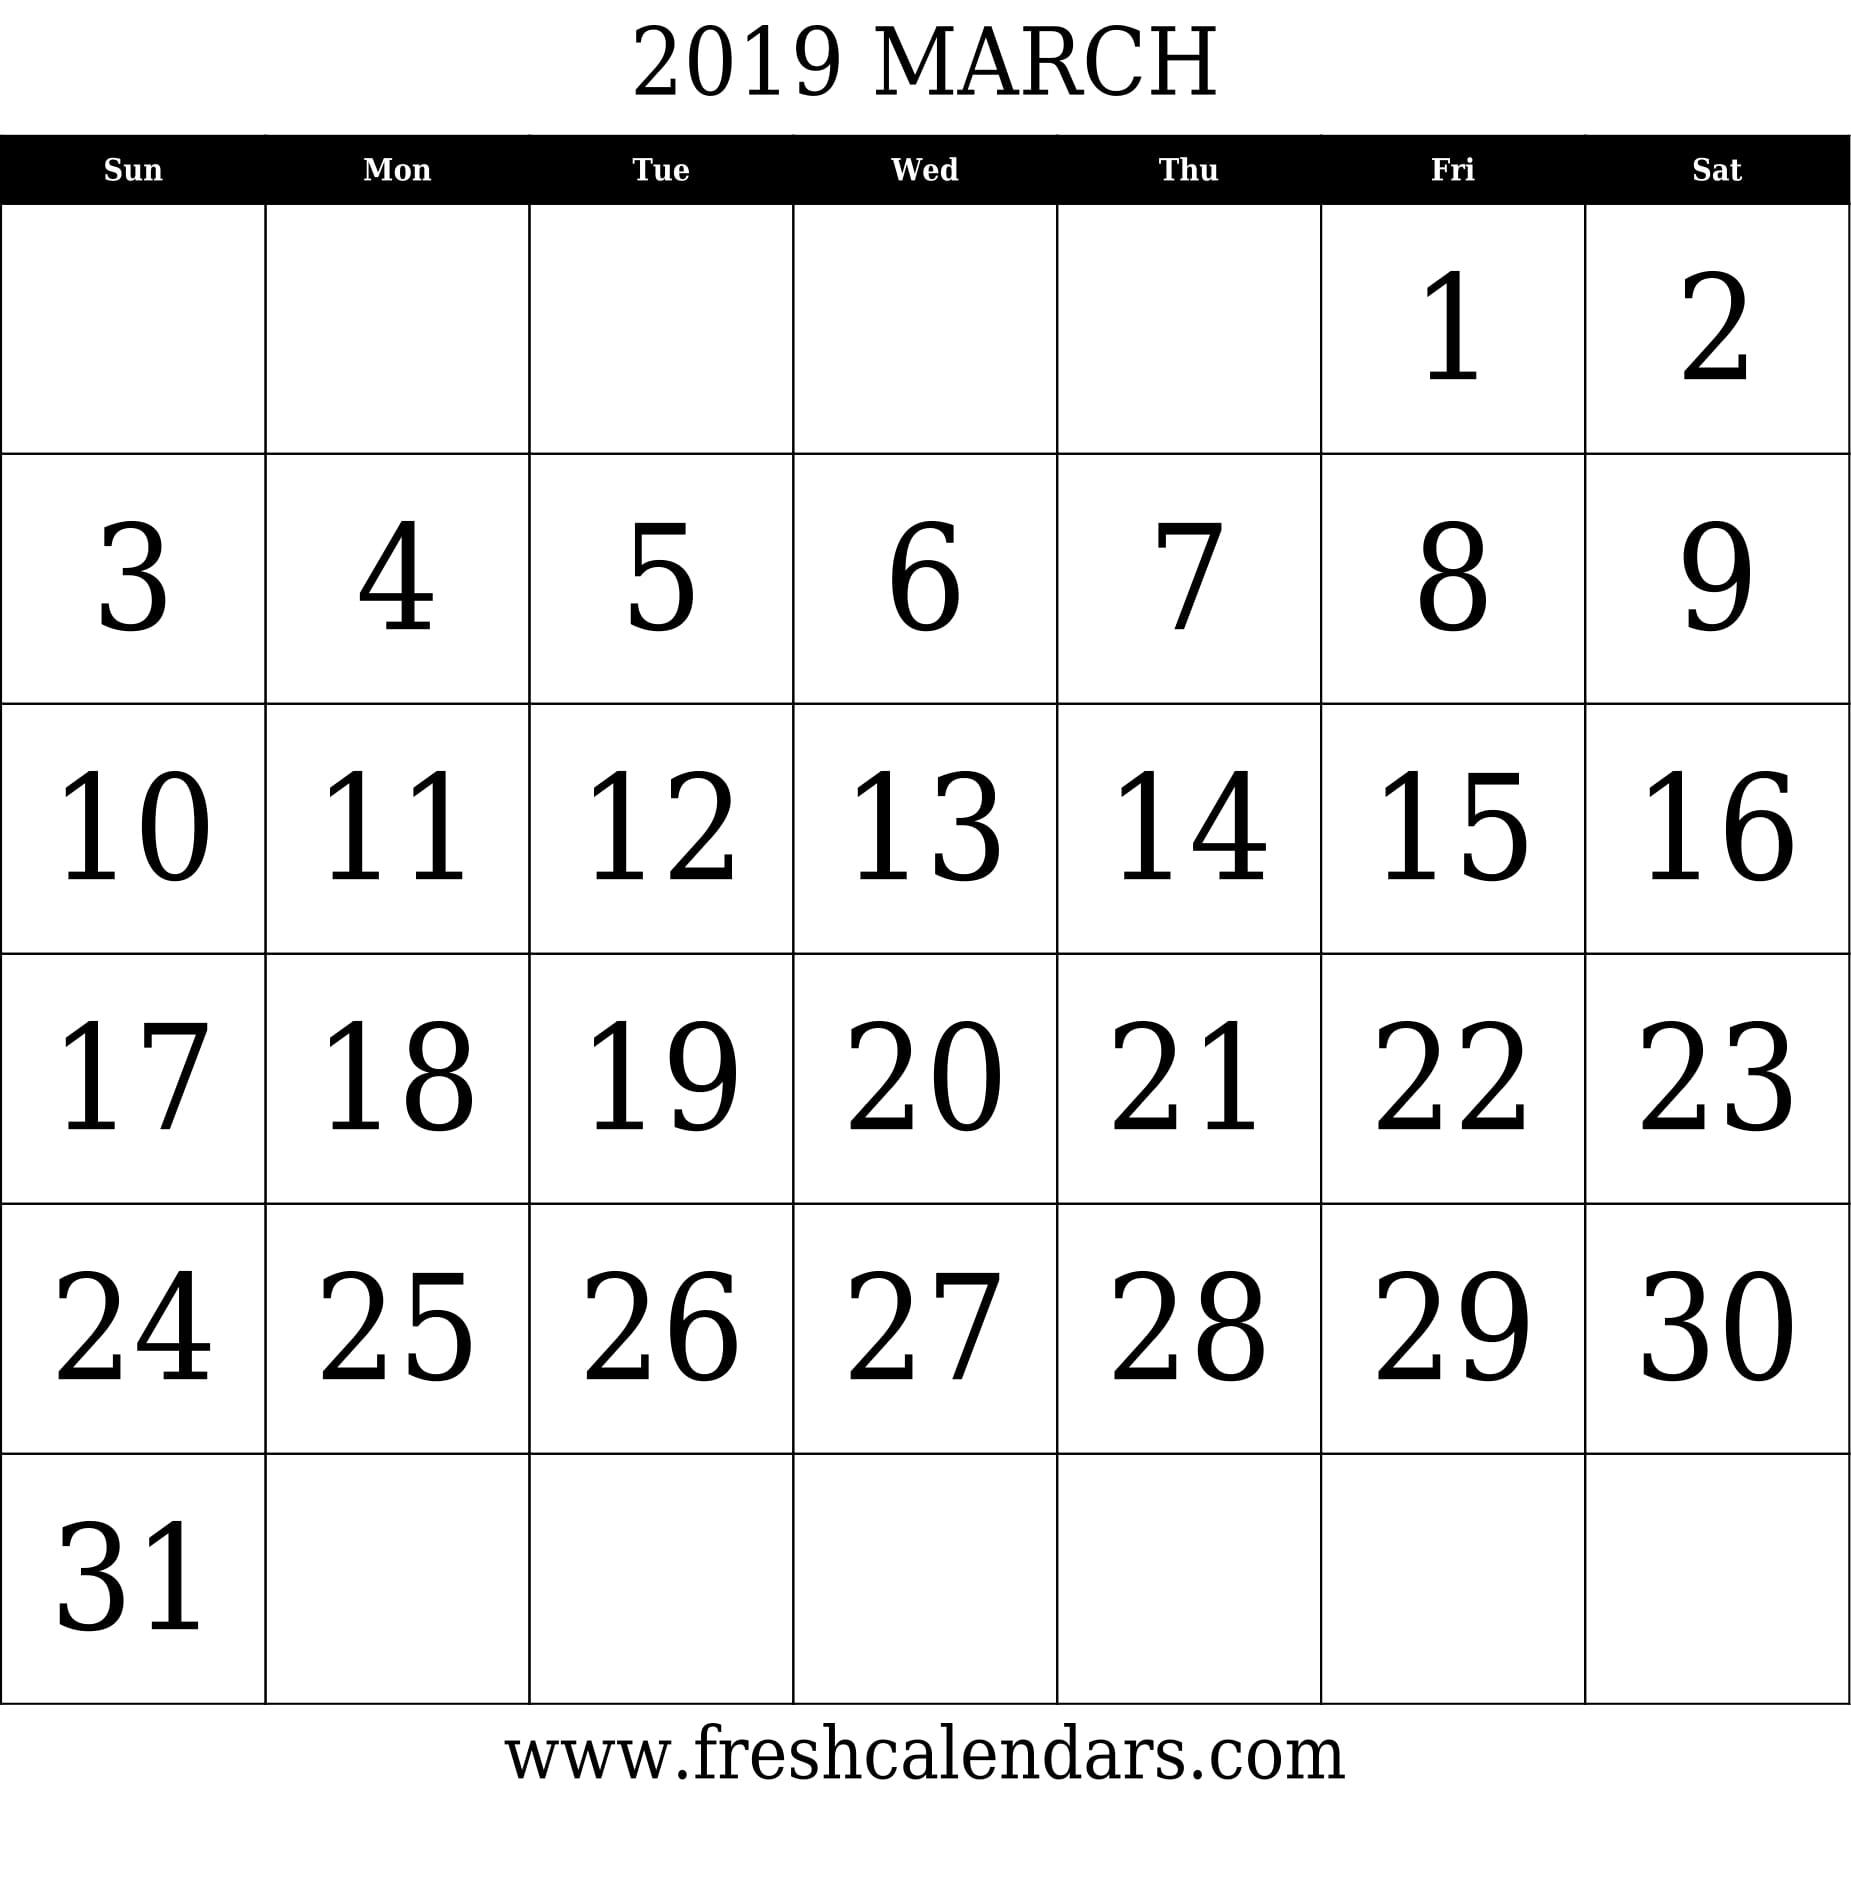 March 2019 Printable Calendar Templates3abry